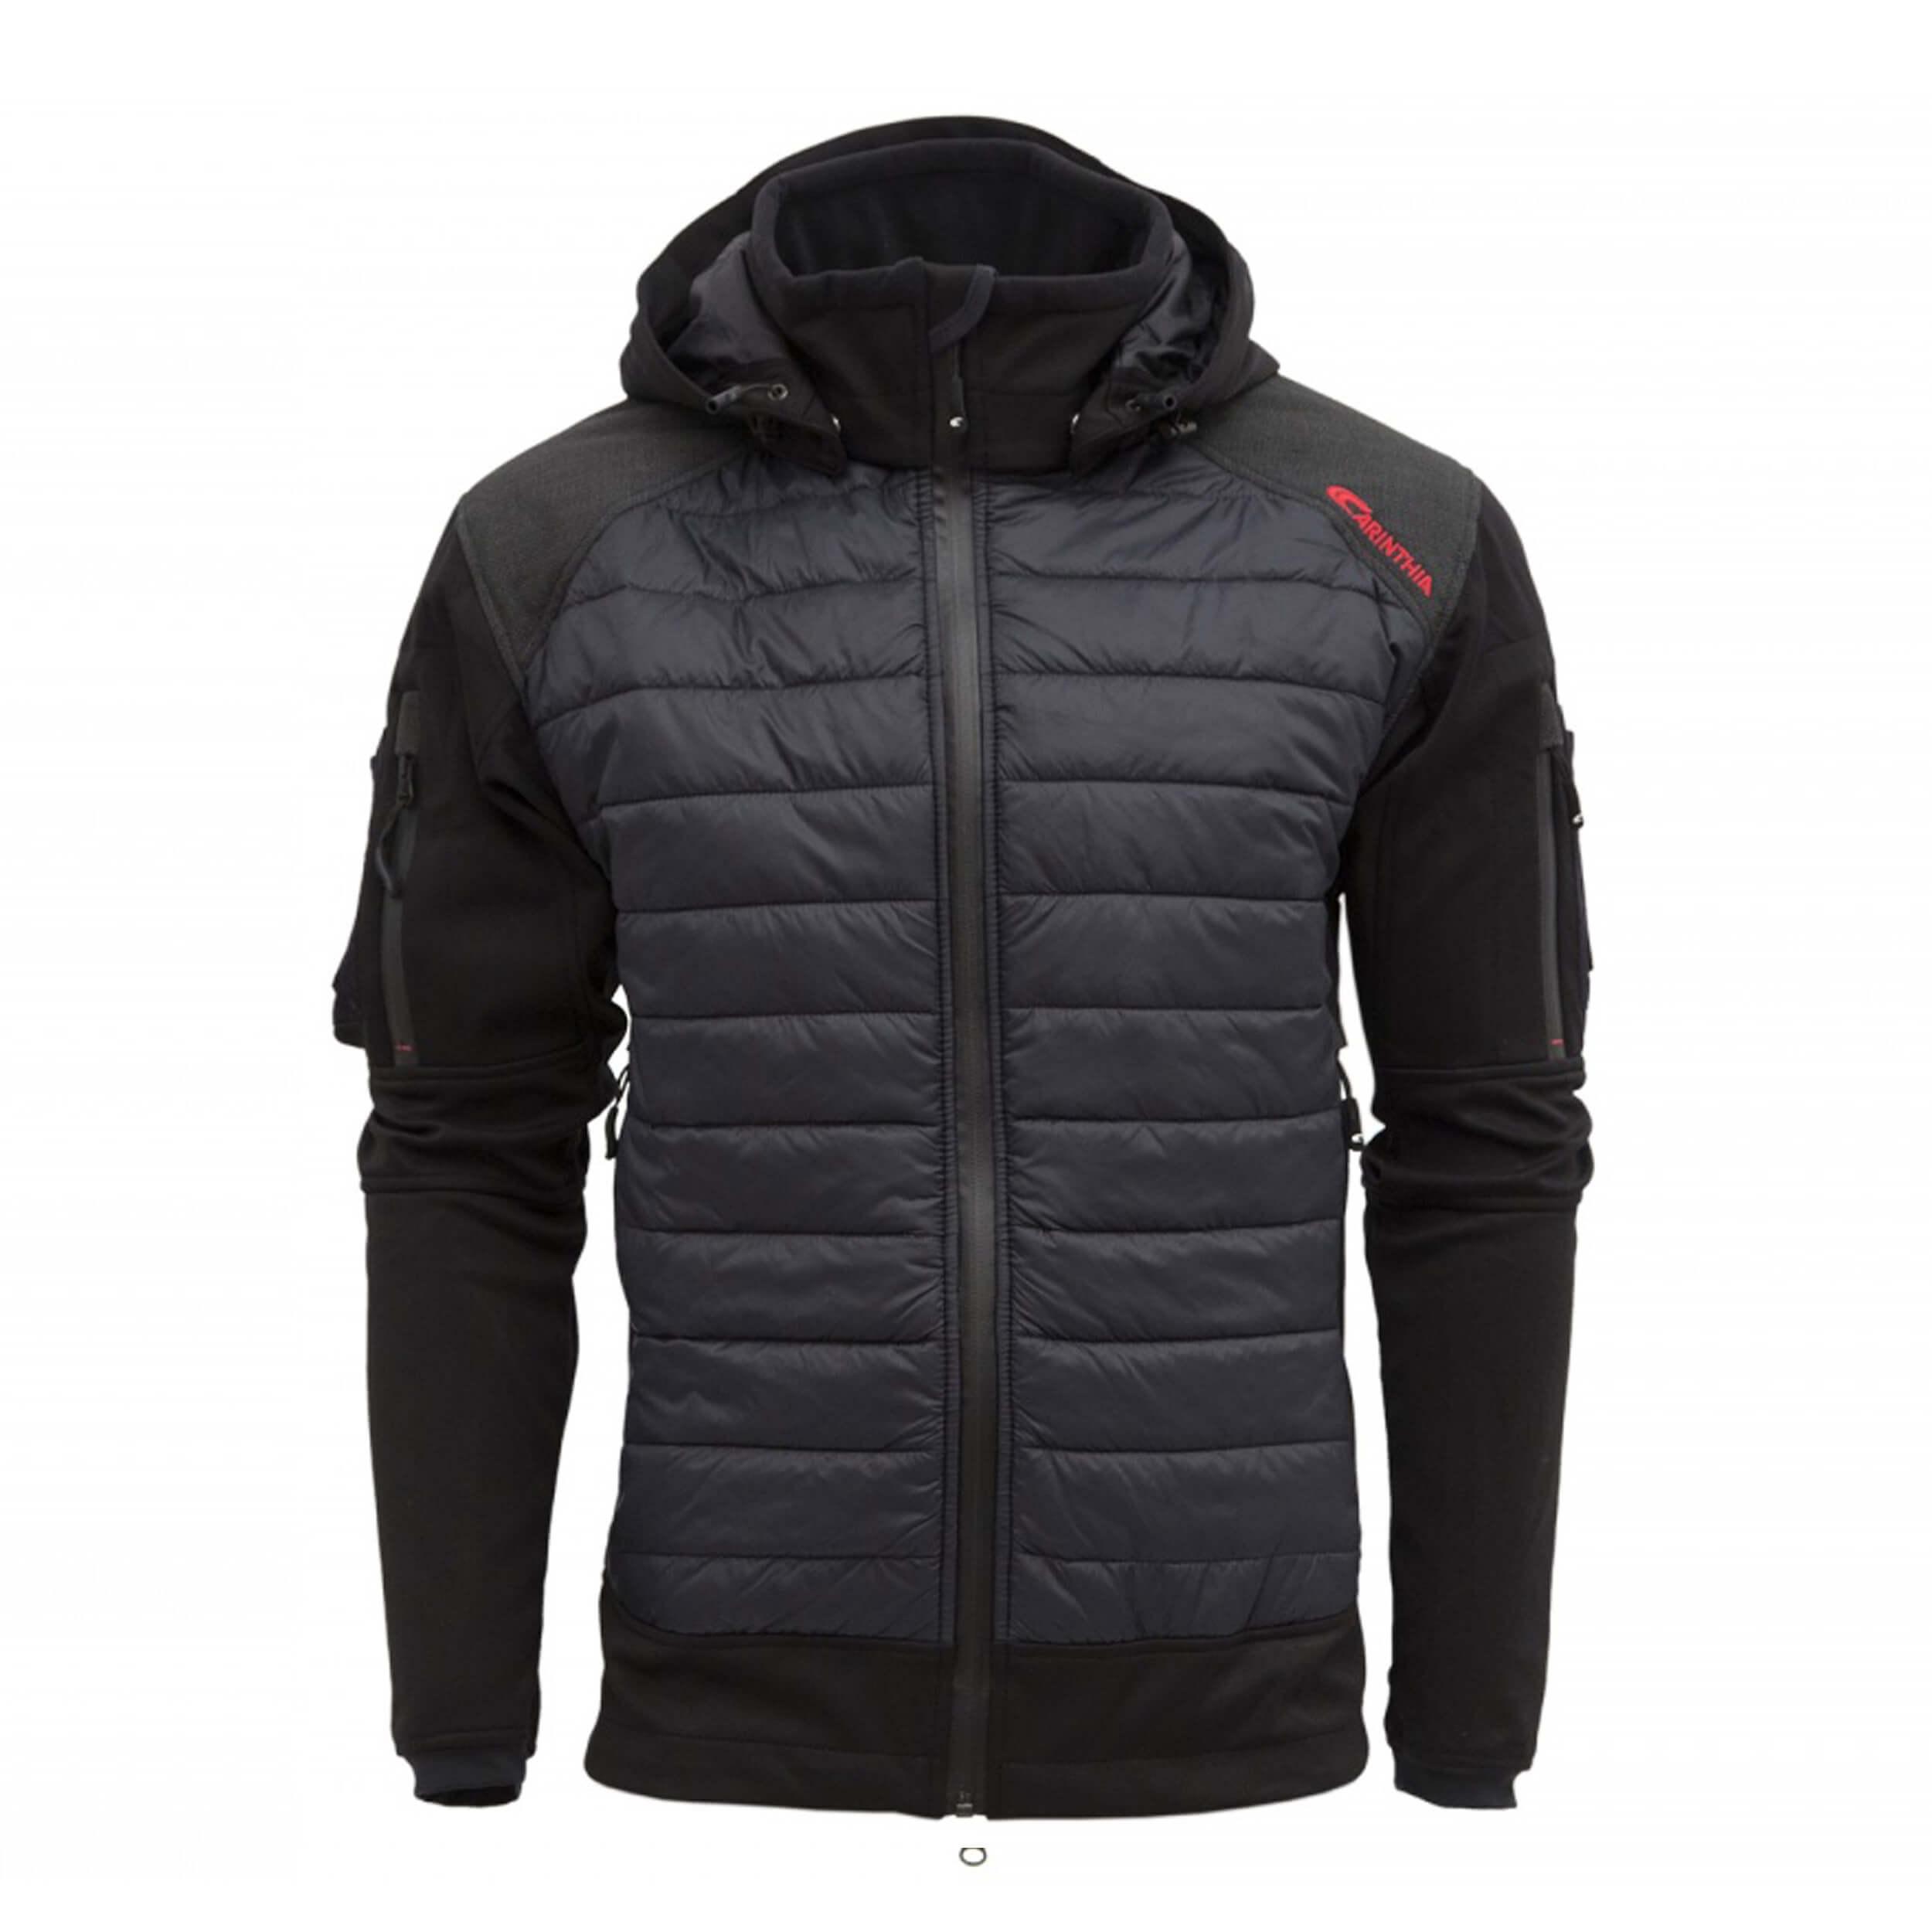 Carinthia G-Loft ISG Jacket 2.0 schwarz